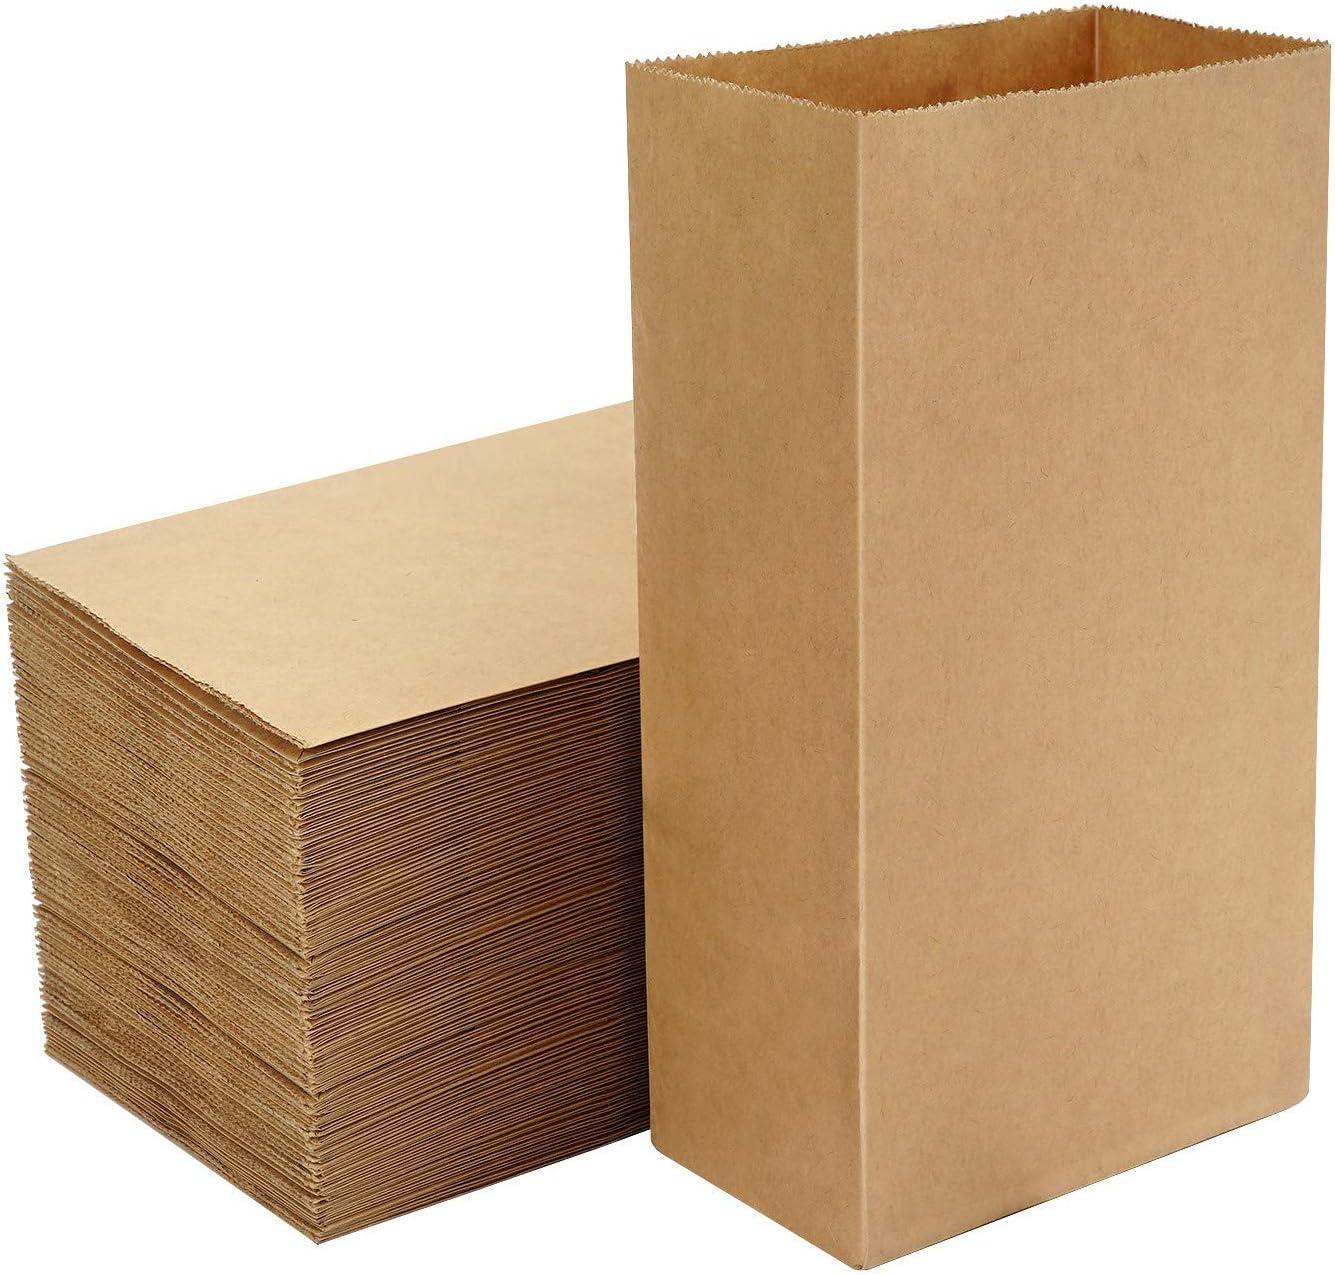 Kraft Food Bags, EUSOAR 100pcs 3lb 8.5x4.7x2.8